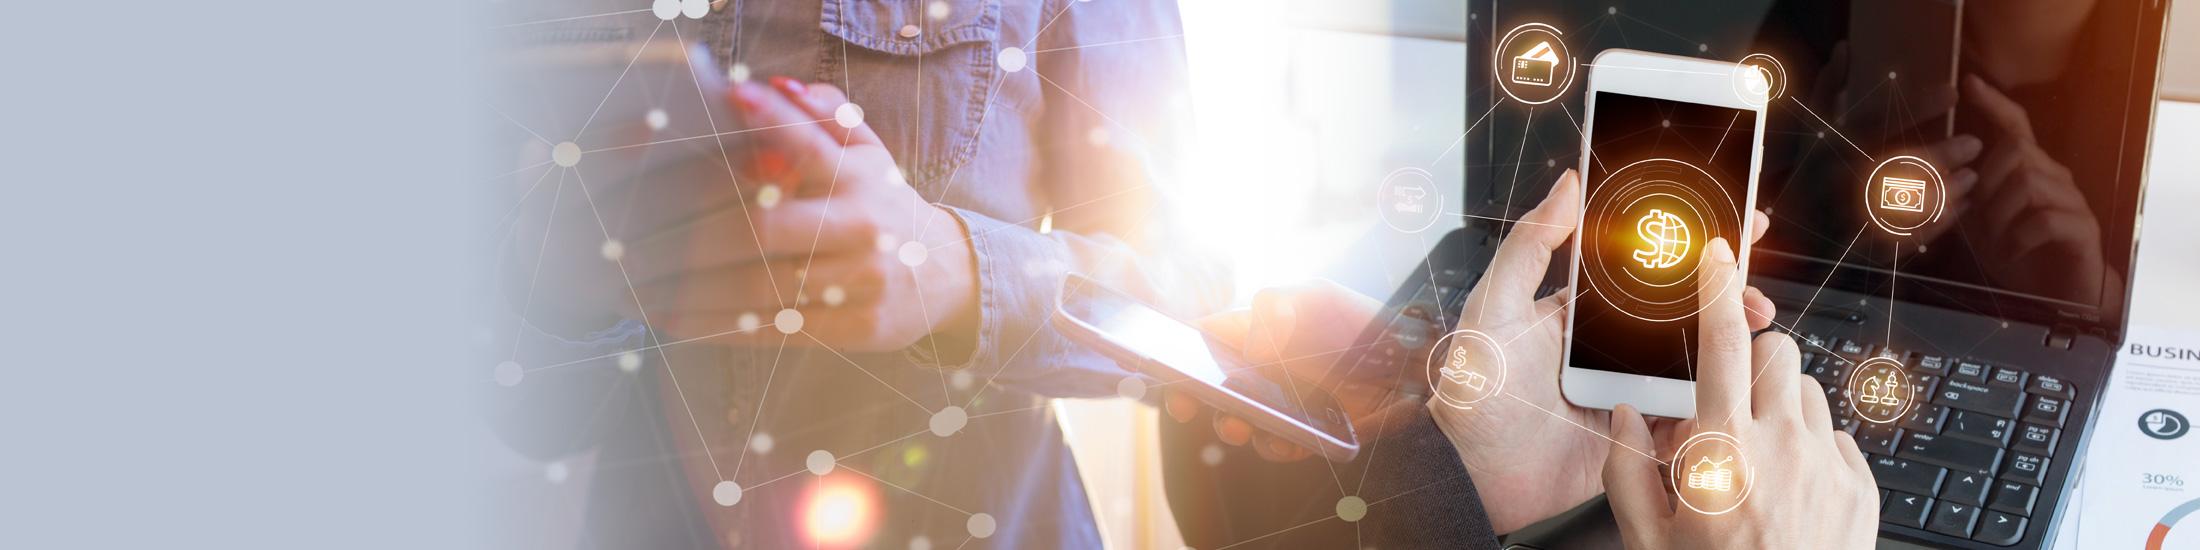 Report: Fraudsters Set Sights on Digital Payment Methods, Goods